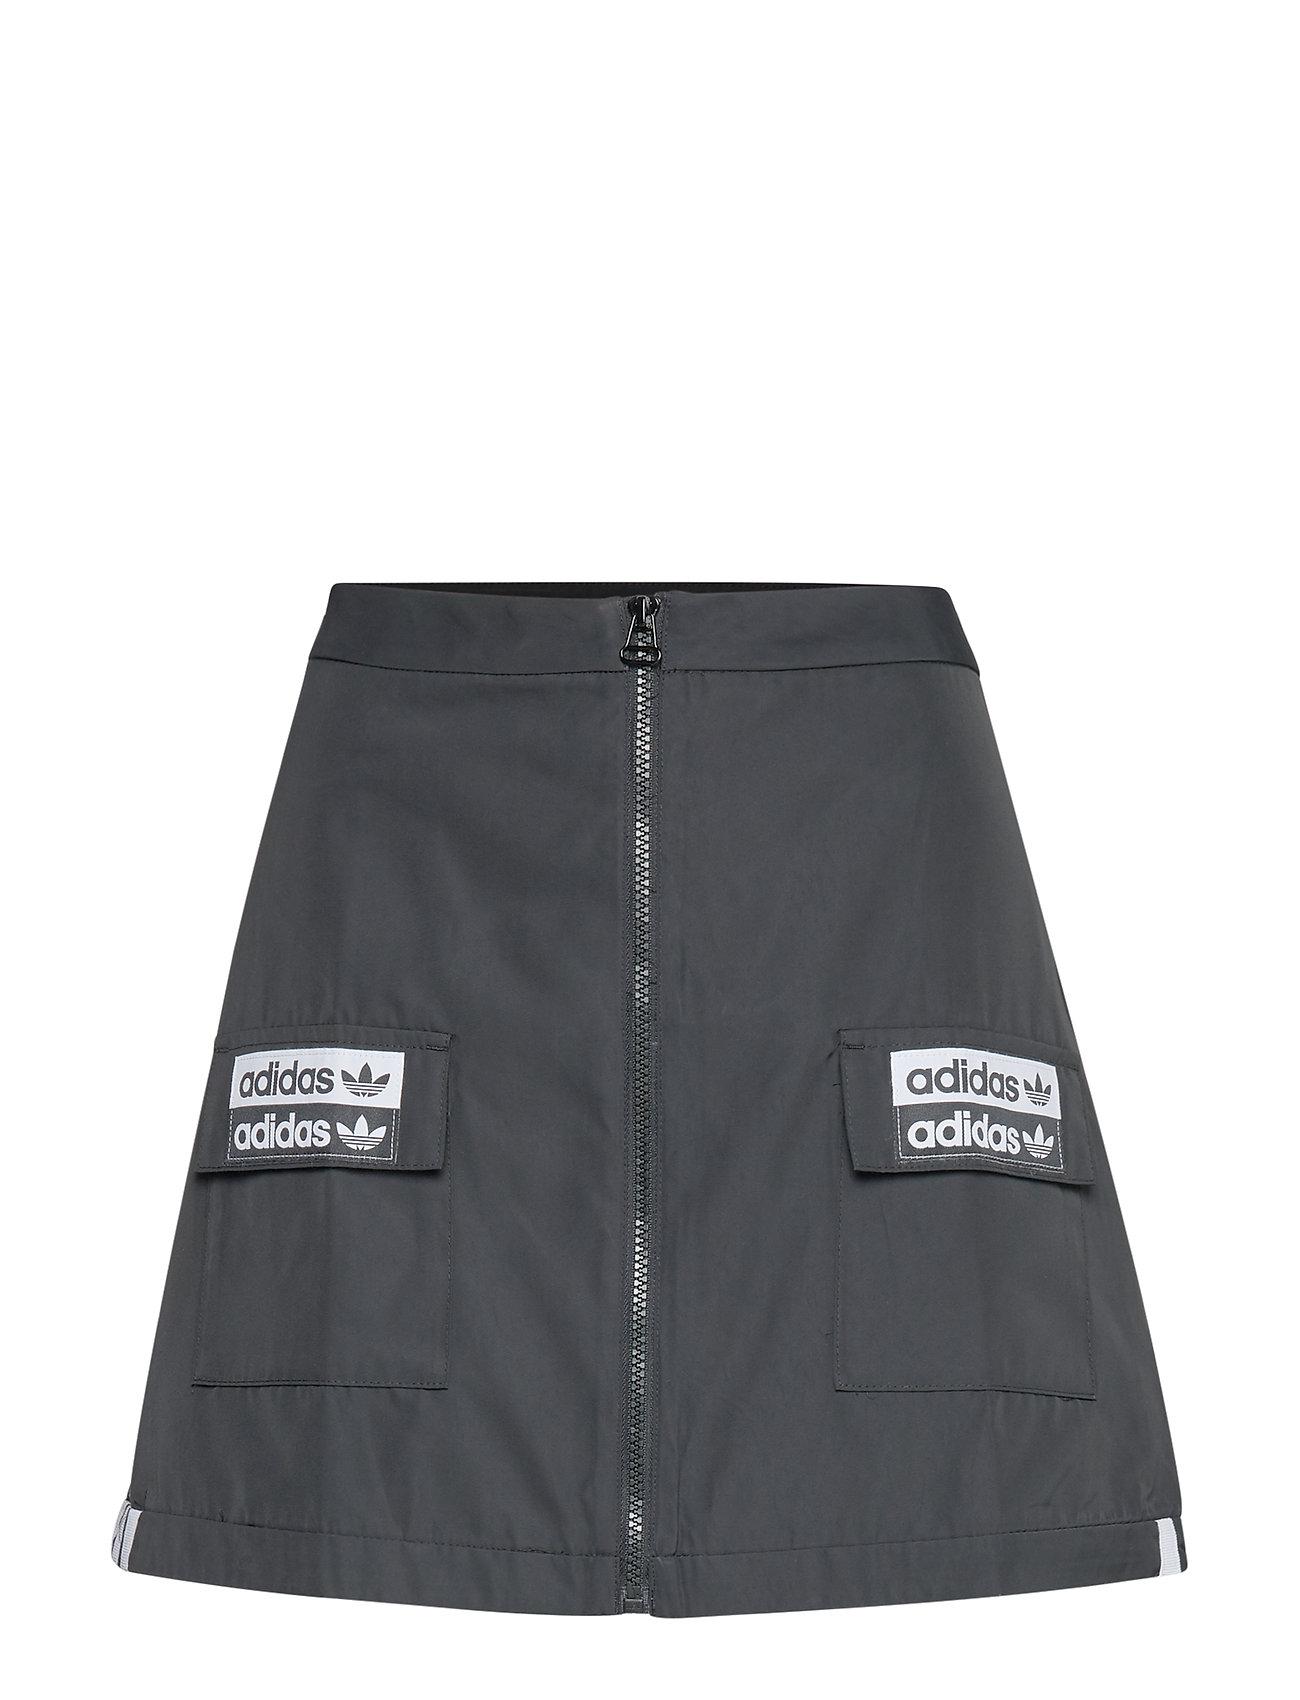 adidas Originals SKIRT - BLACK